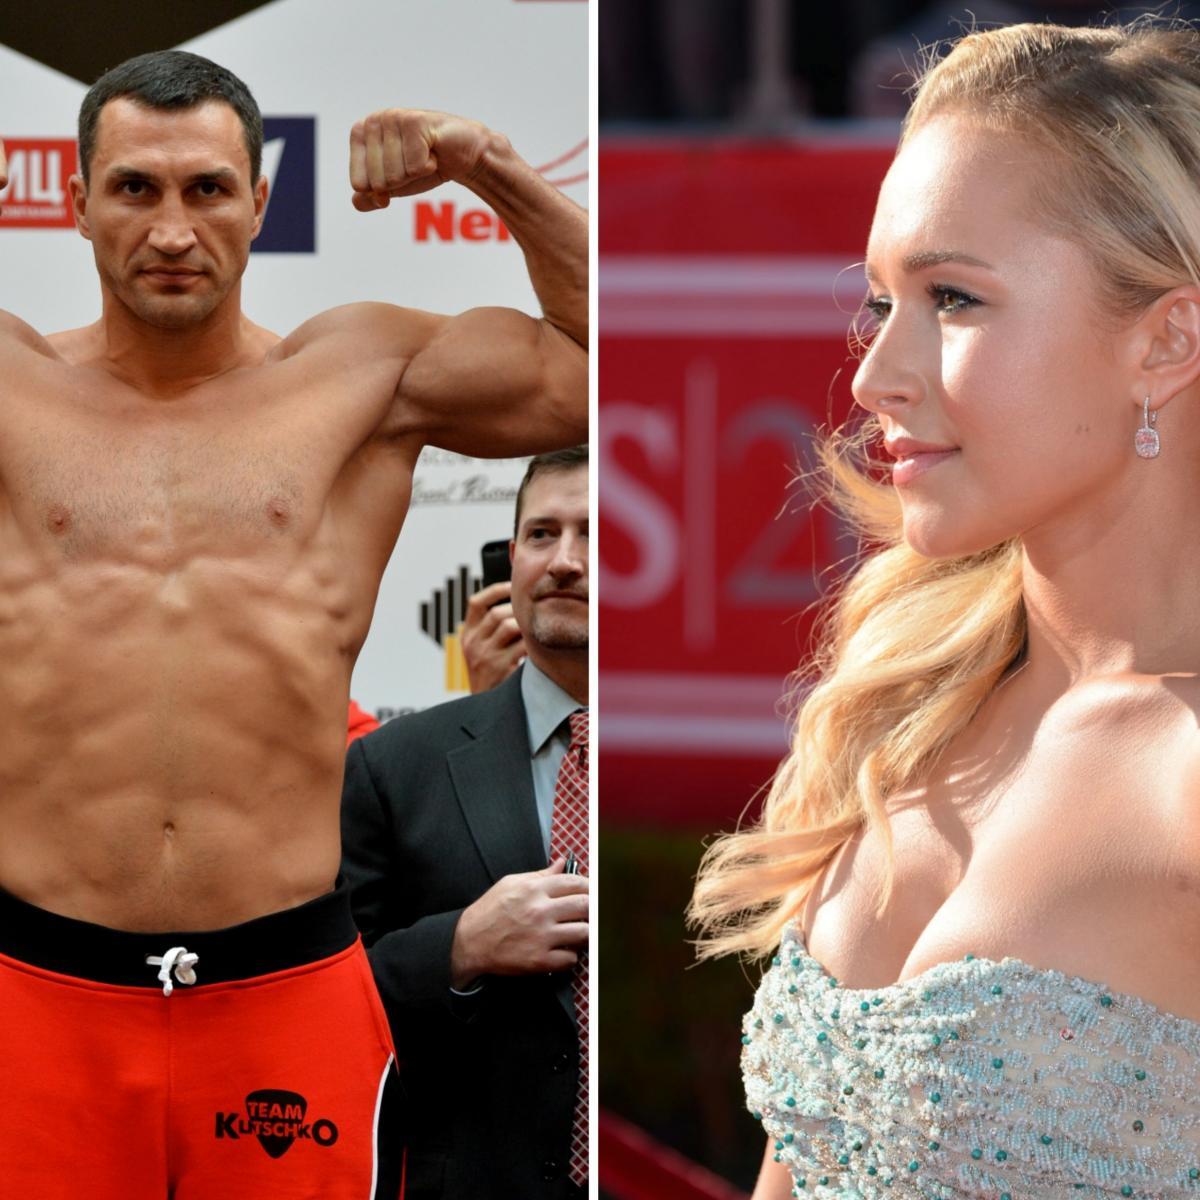 Wladimir Klitschko And Hayden Panettiere Are Engaged, So